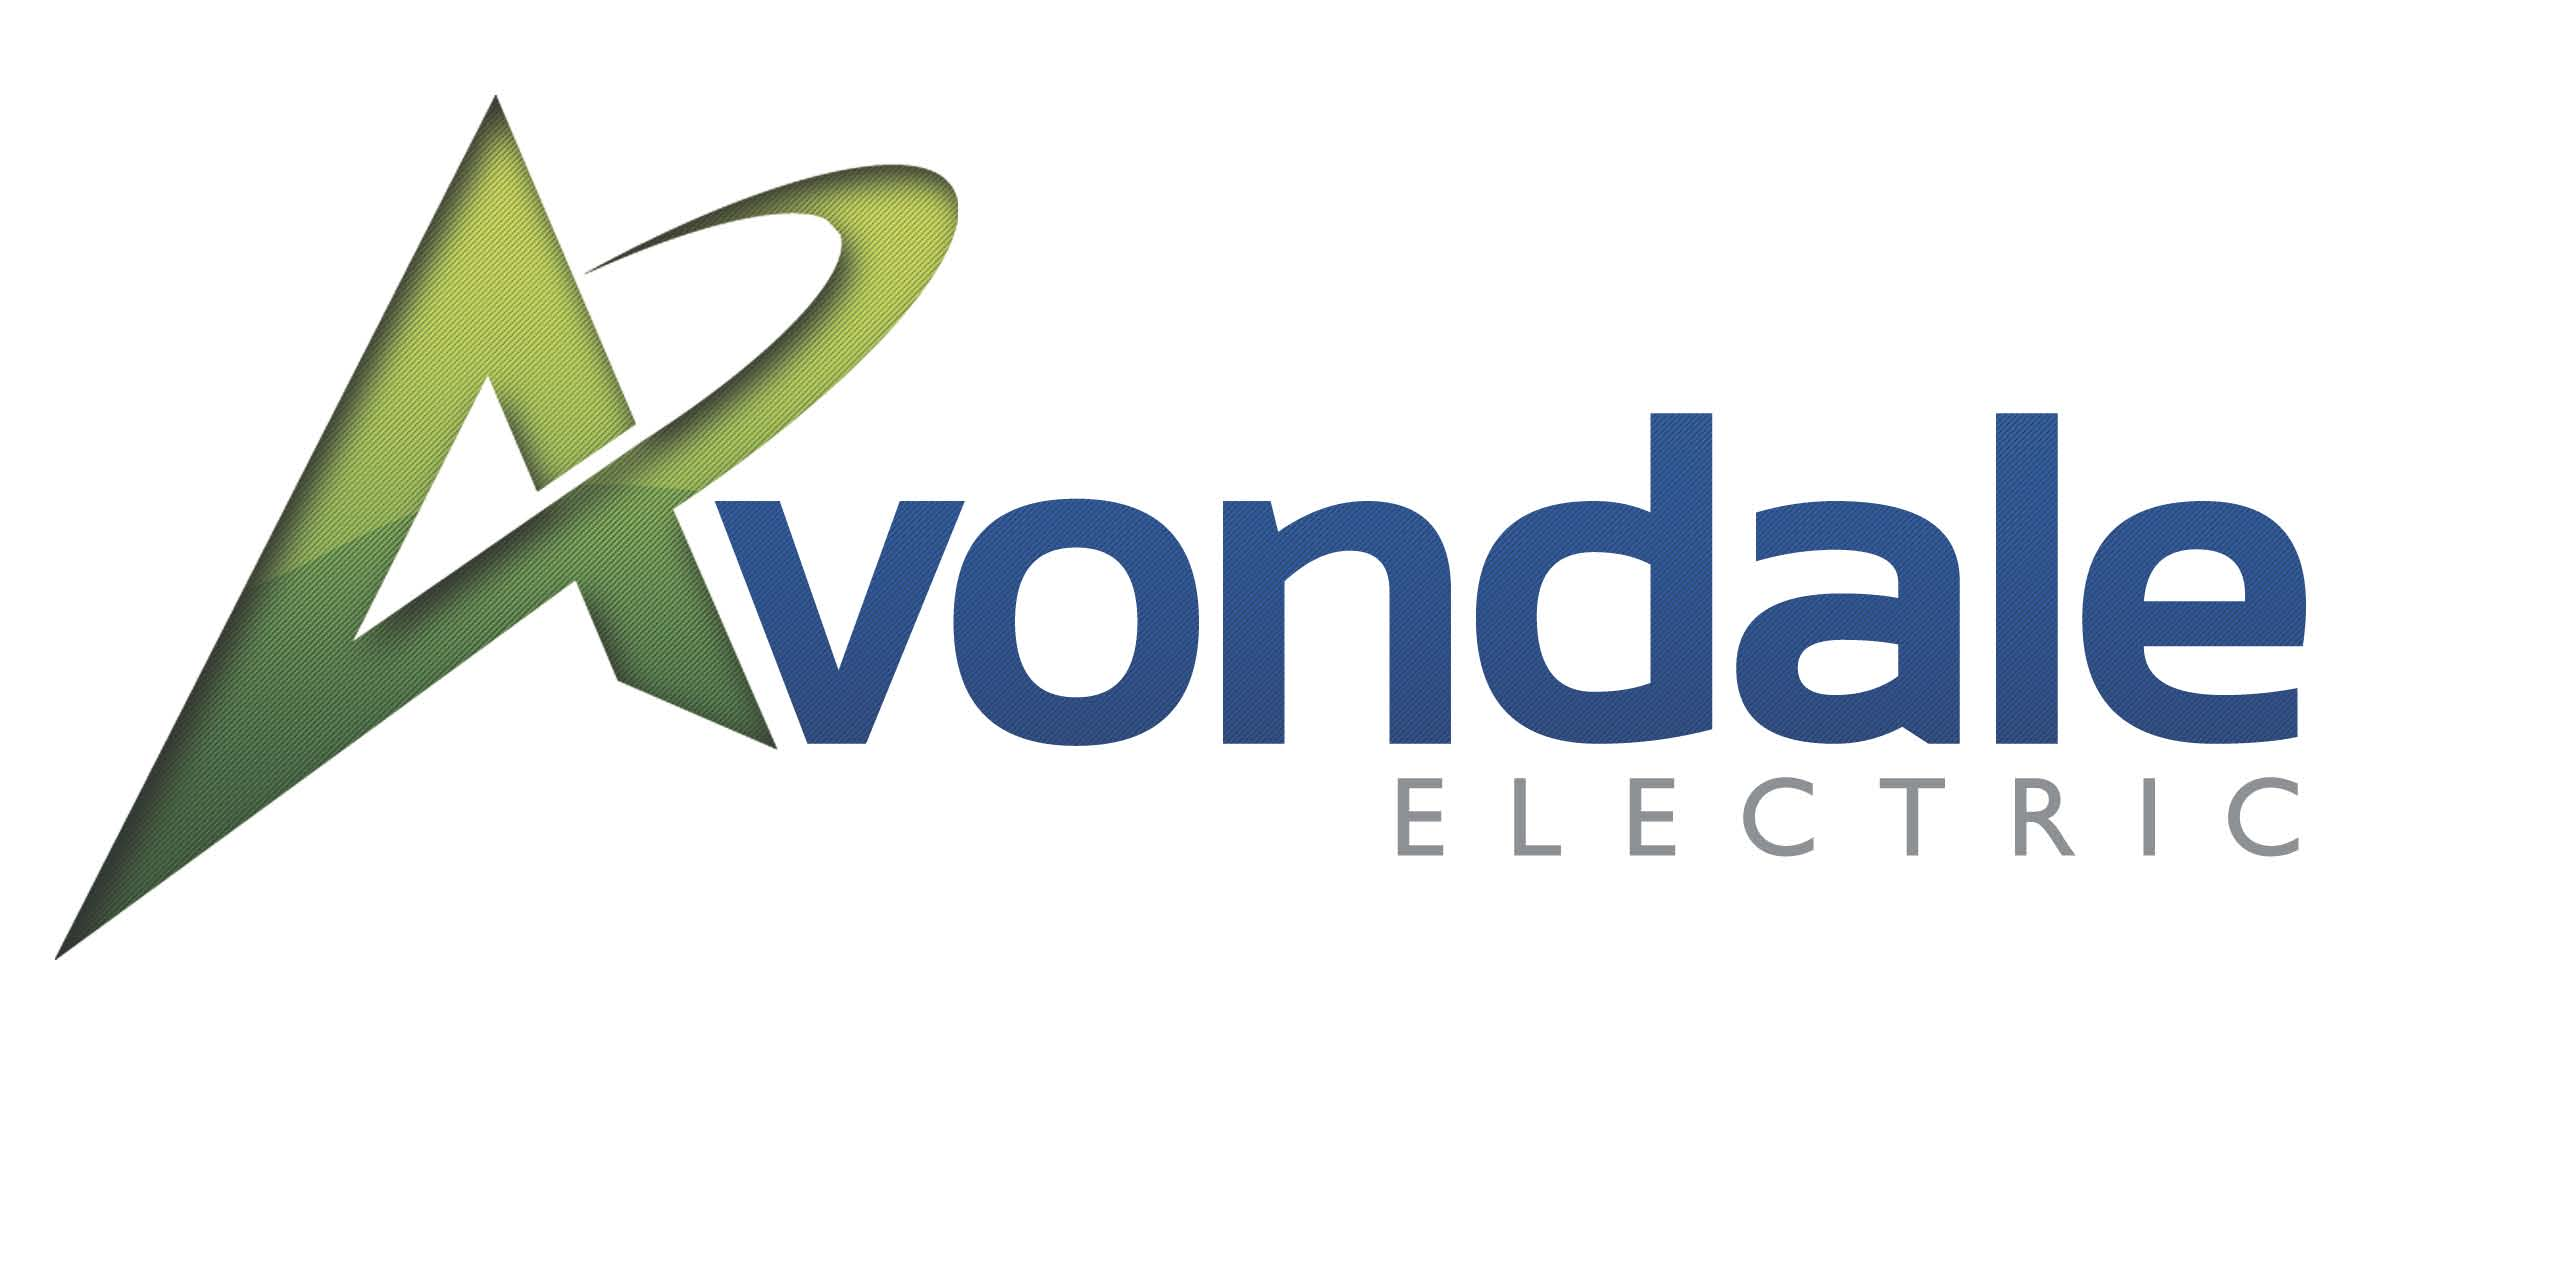 Avondale Electric